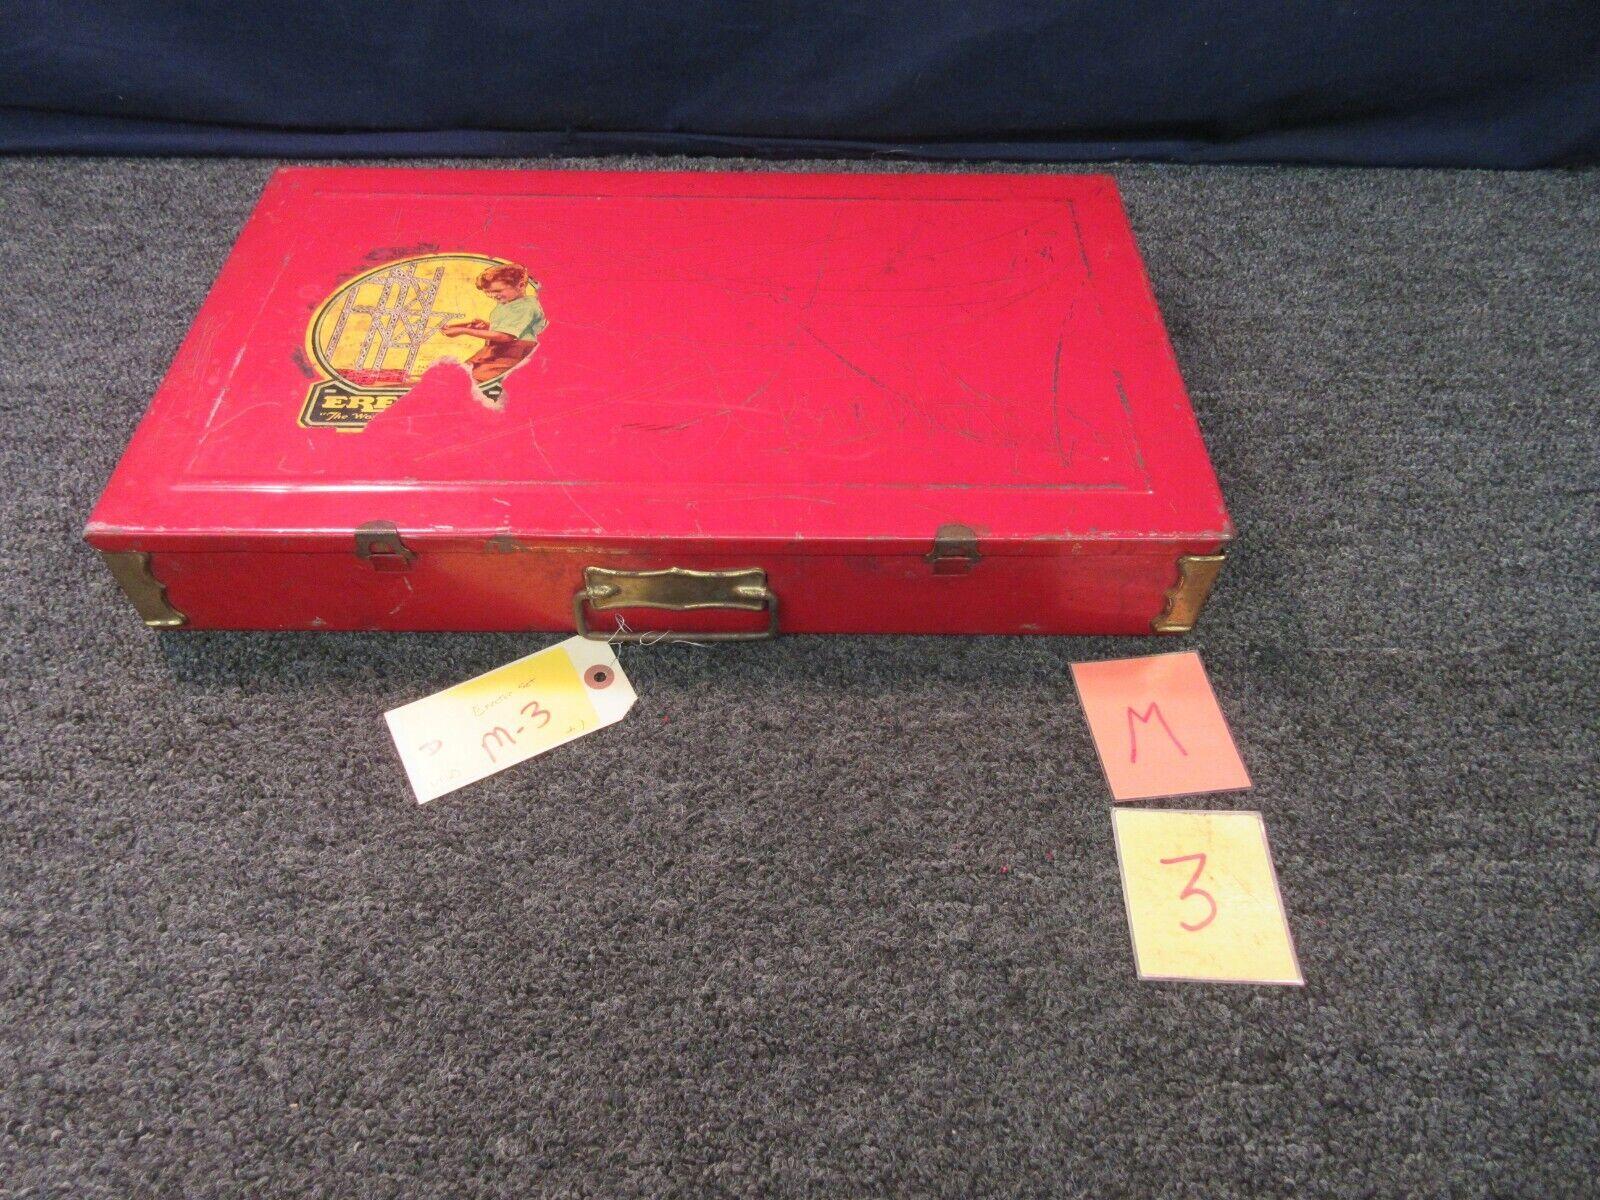 AC Gilbert Vintage Erector Set Metal Box Case 8 1 2 Toy All Electric 20x 12x 3